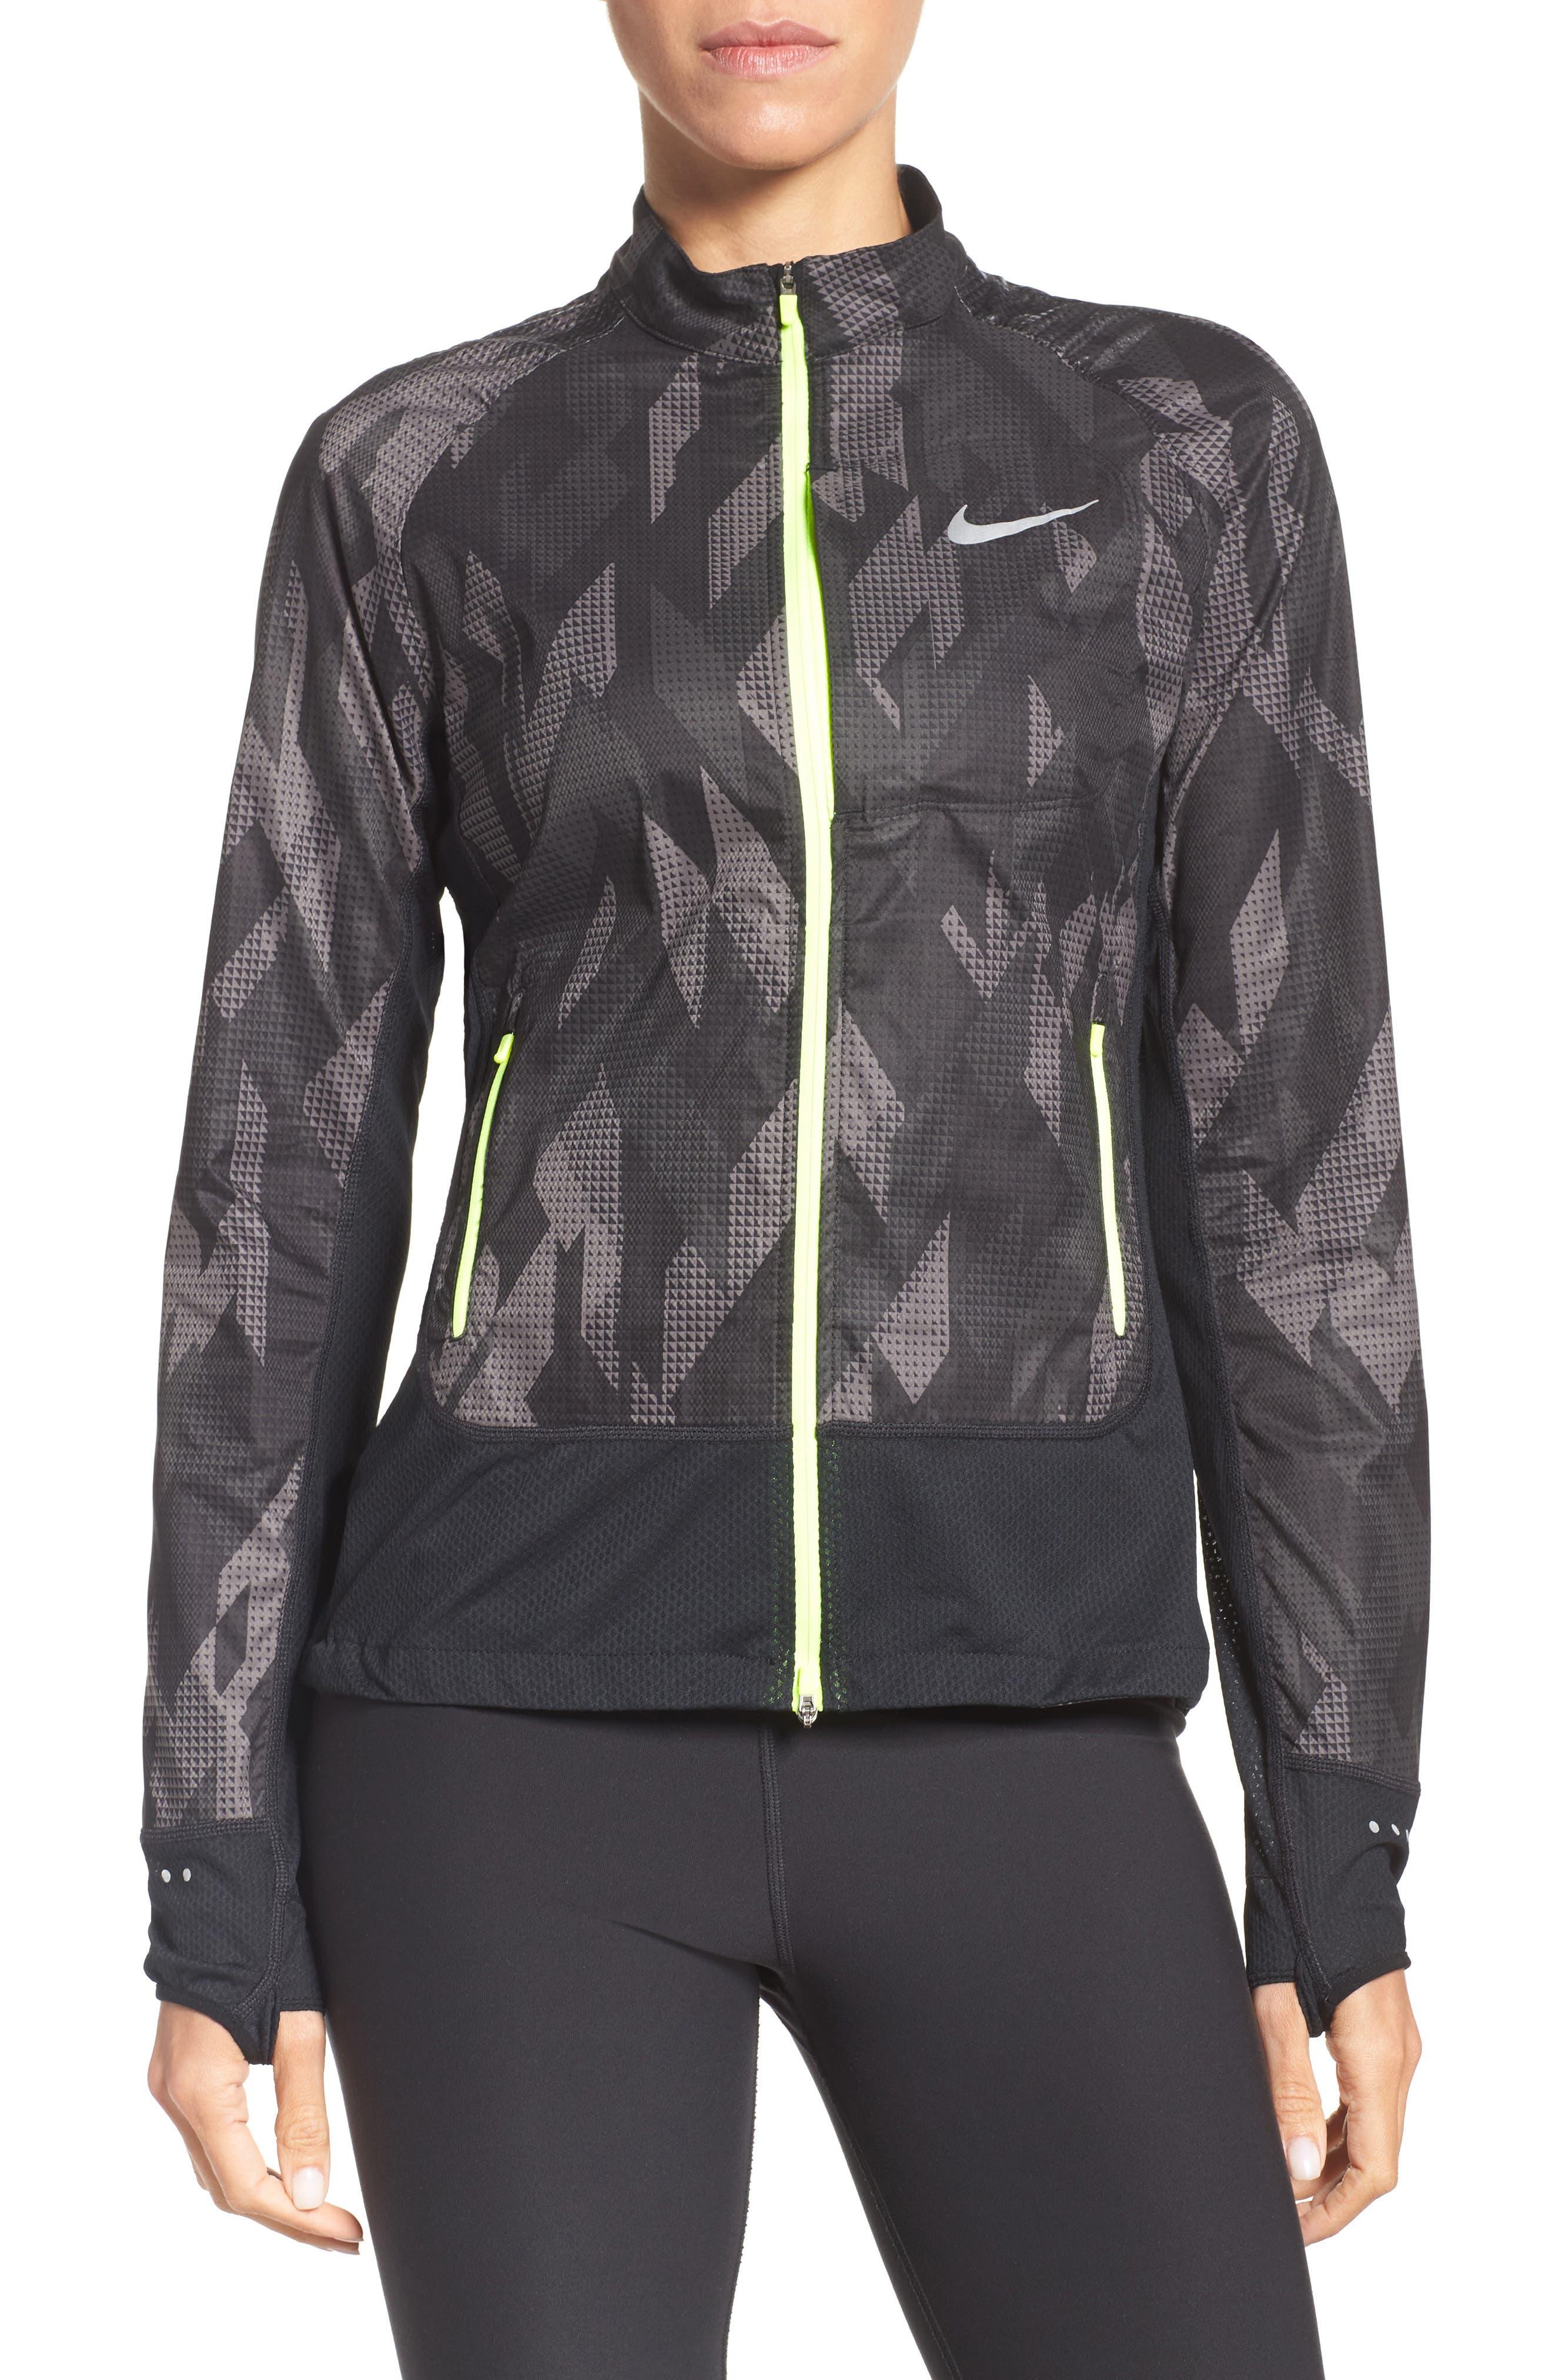 Flex Running Jacket,                         Main,                         color, Black/ Black/ Volt